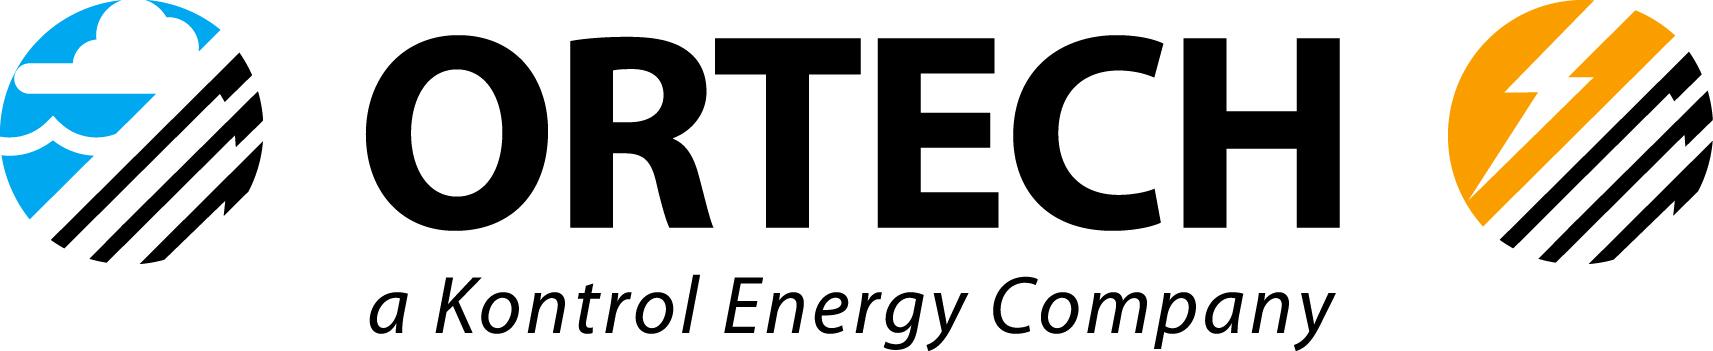 ORTECH_logo_Kontrol.jpg